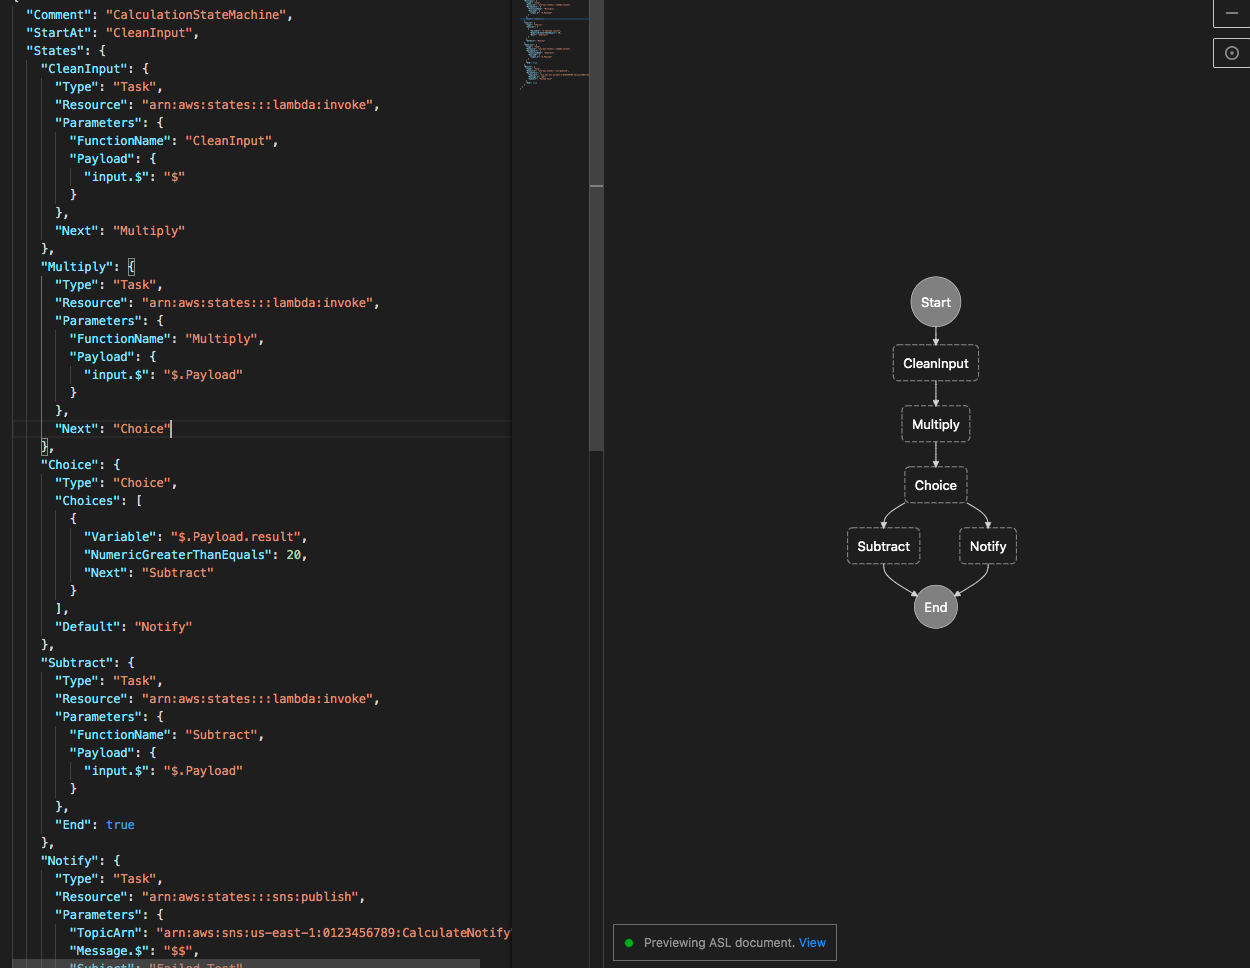 AWS StateMachine Visualization in VSCode